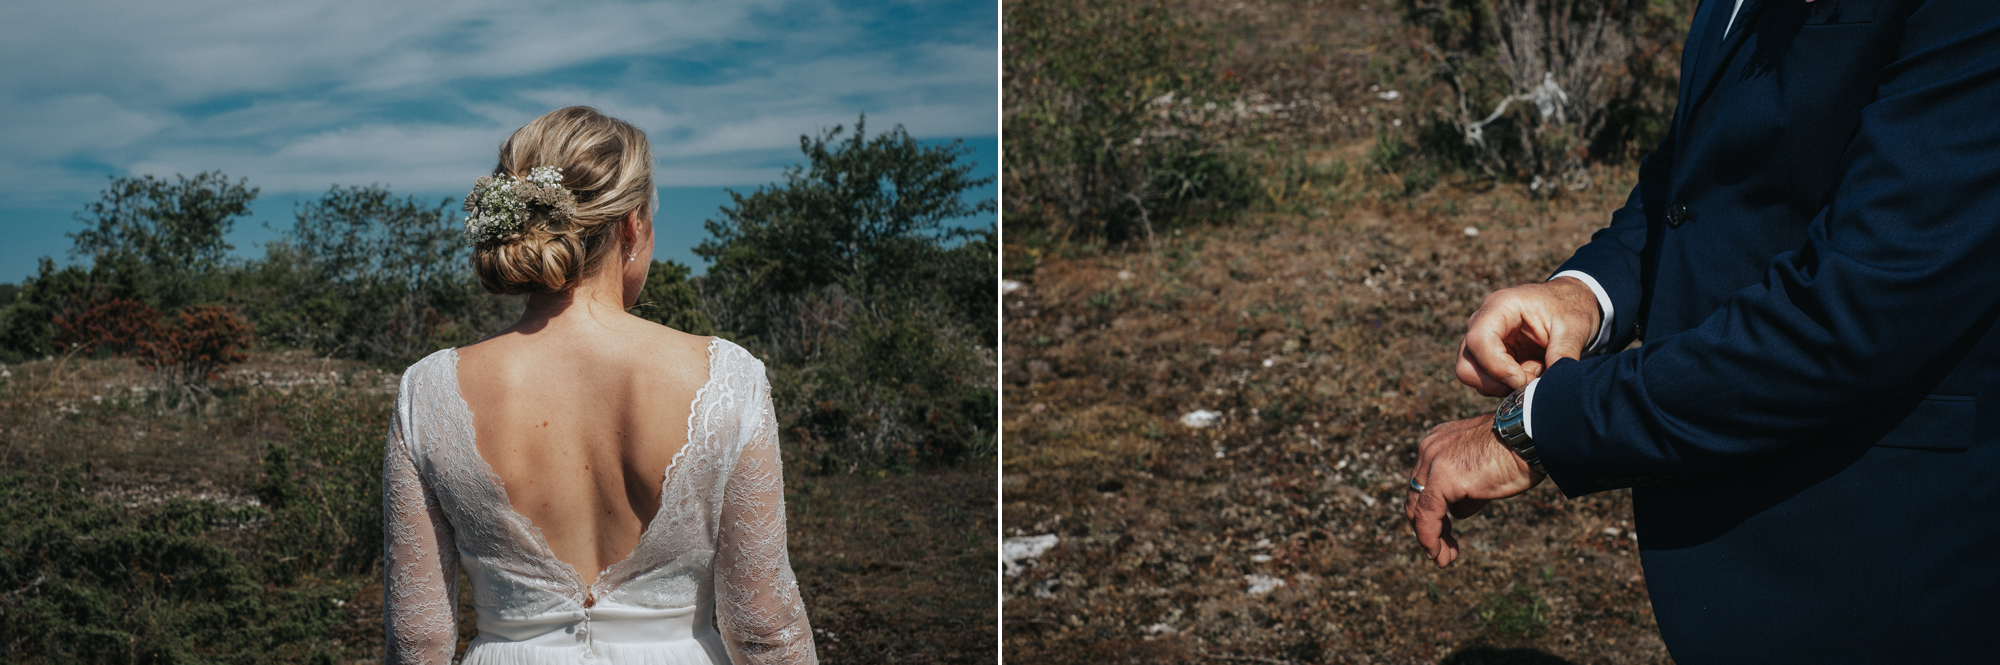 009-bröllopsfotograf-fårö-neas-fotografi.jpg